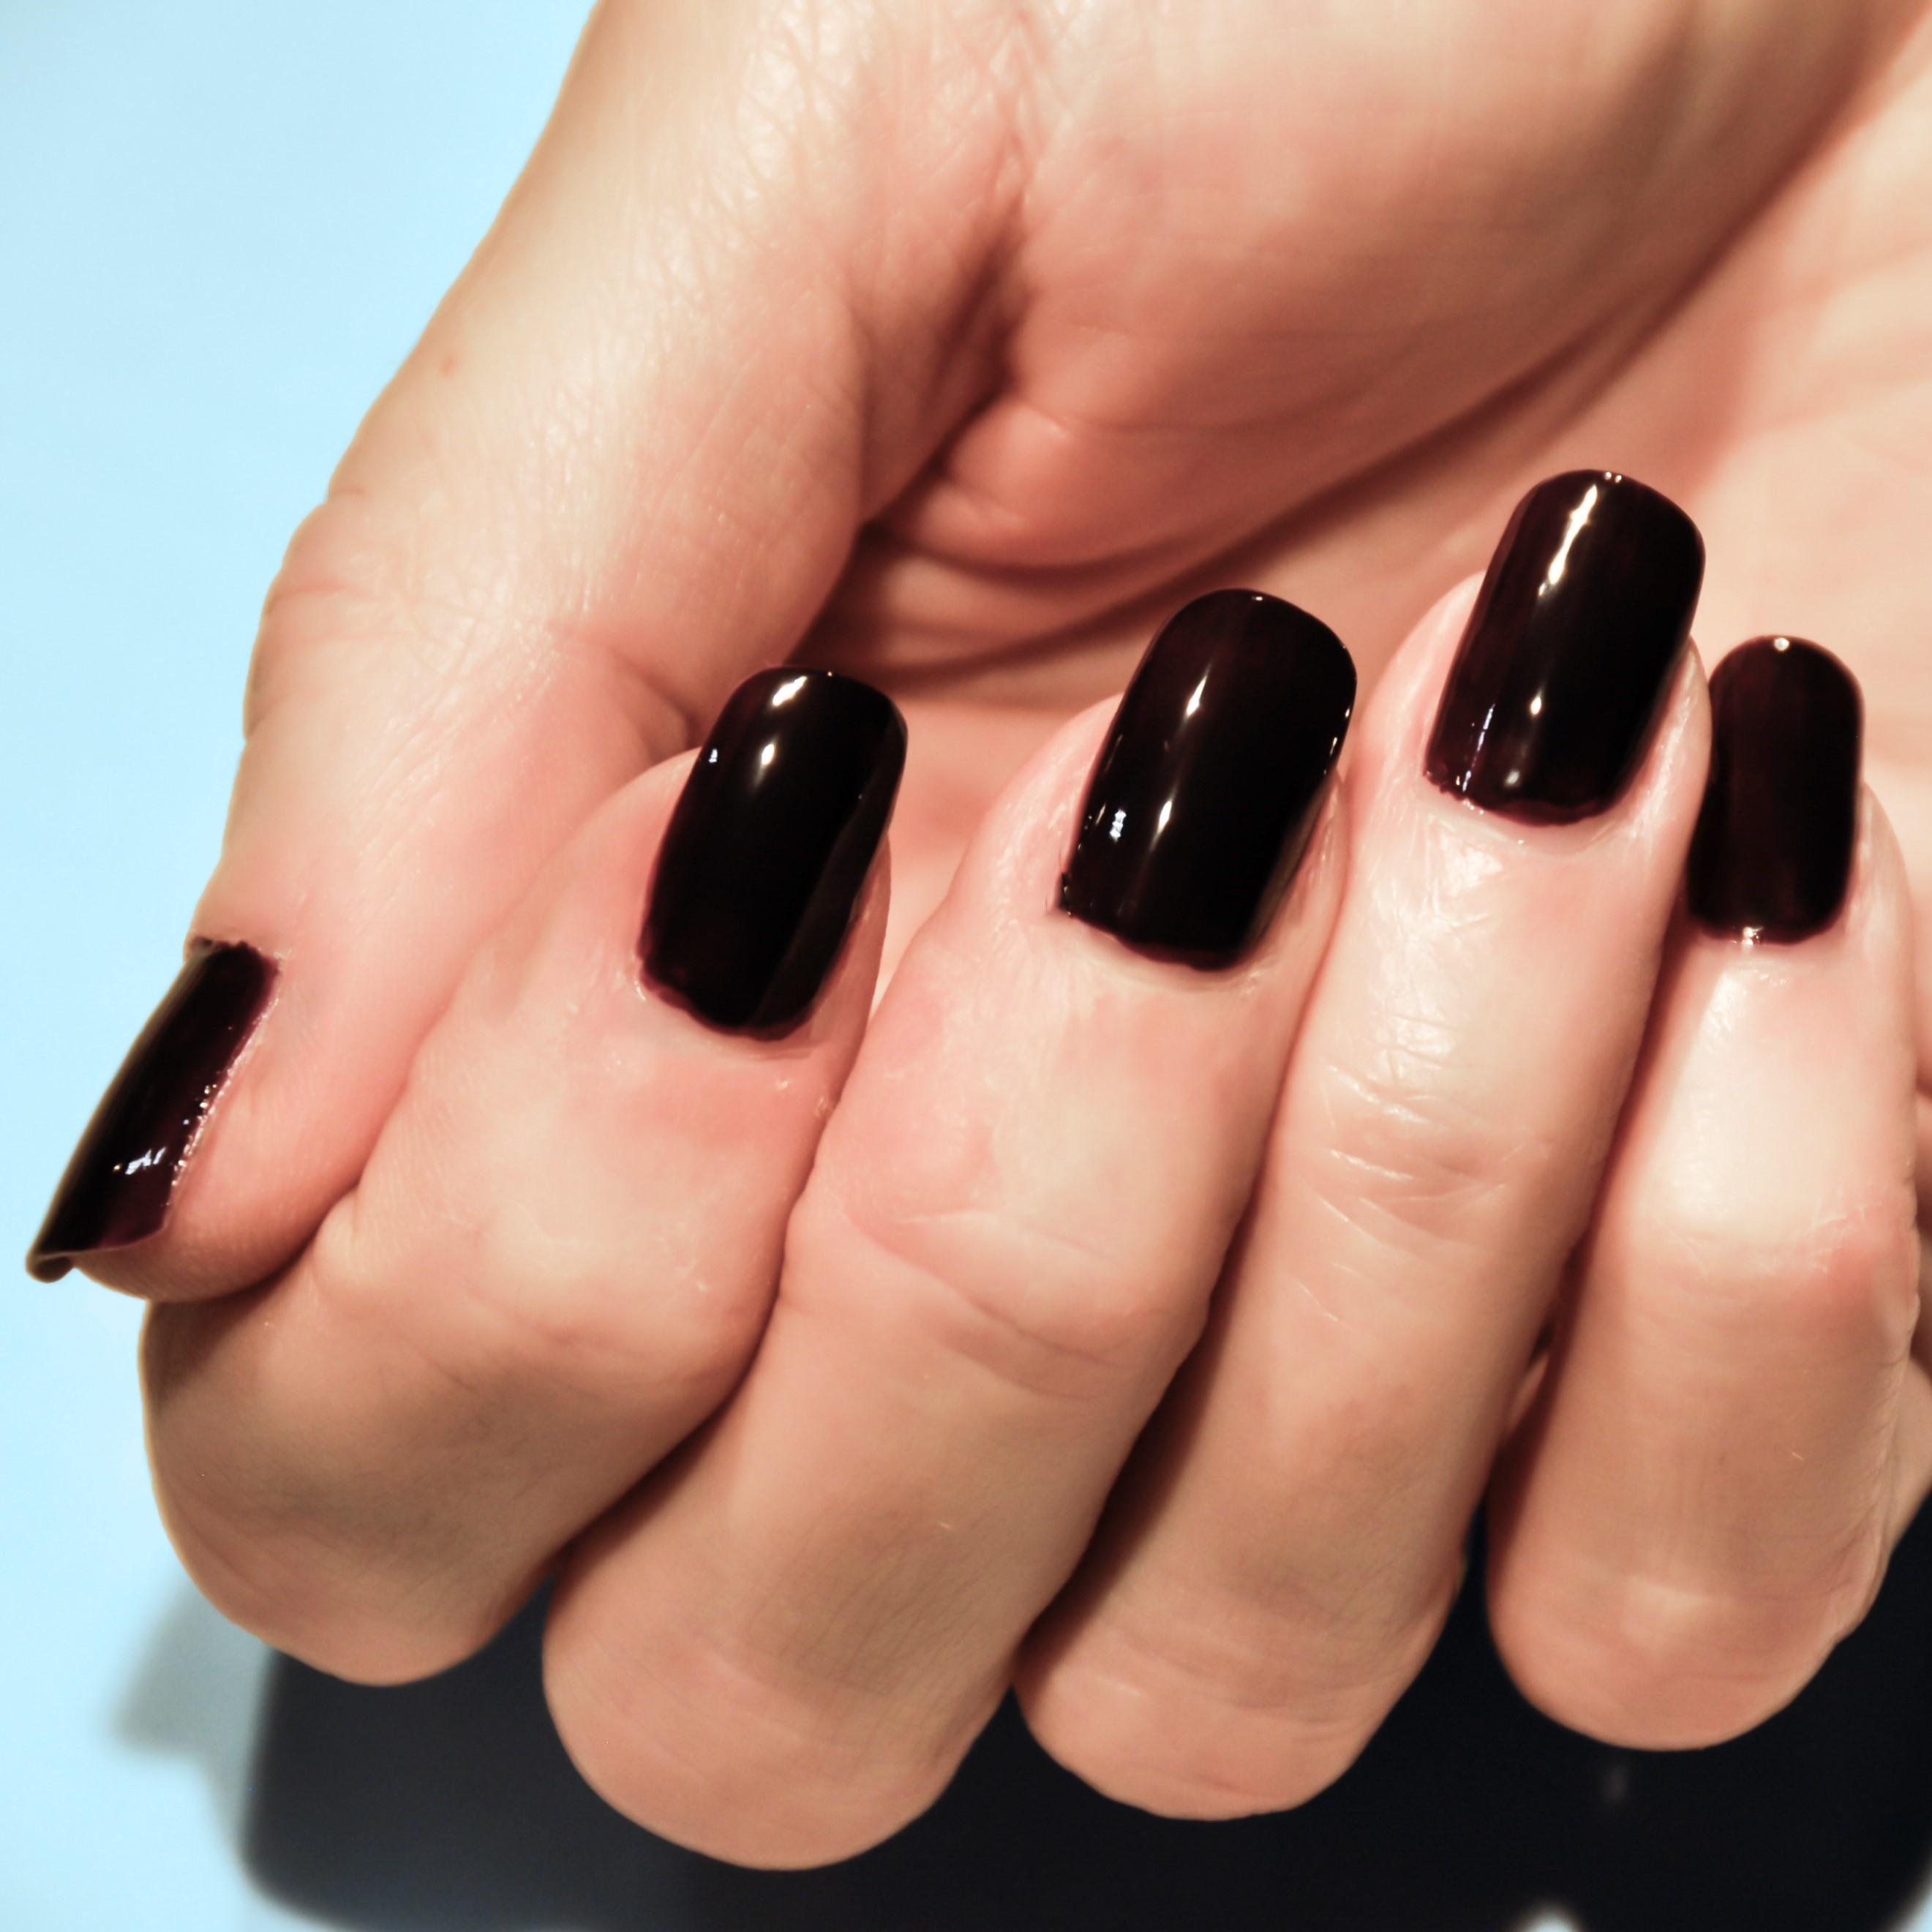 How to make perfect nails at home - bwcshop.com